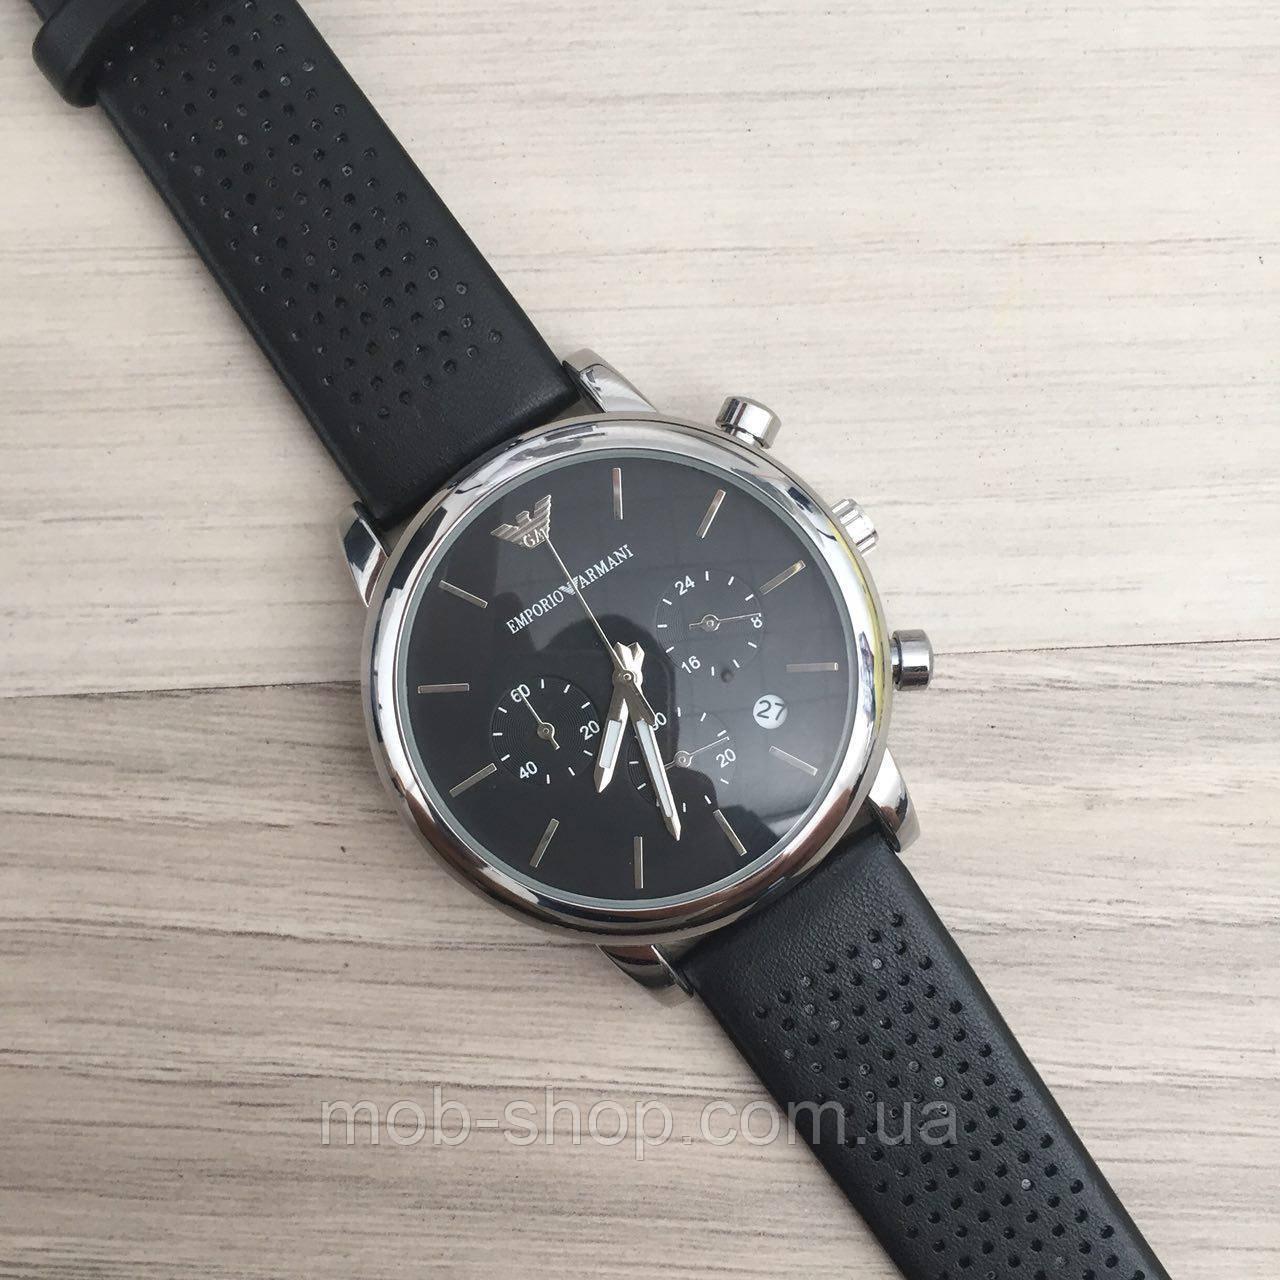 Наручные часы Emporio Armani AA AR903